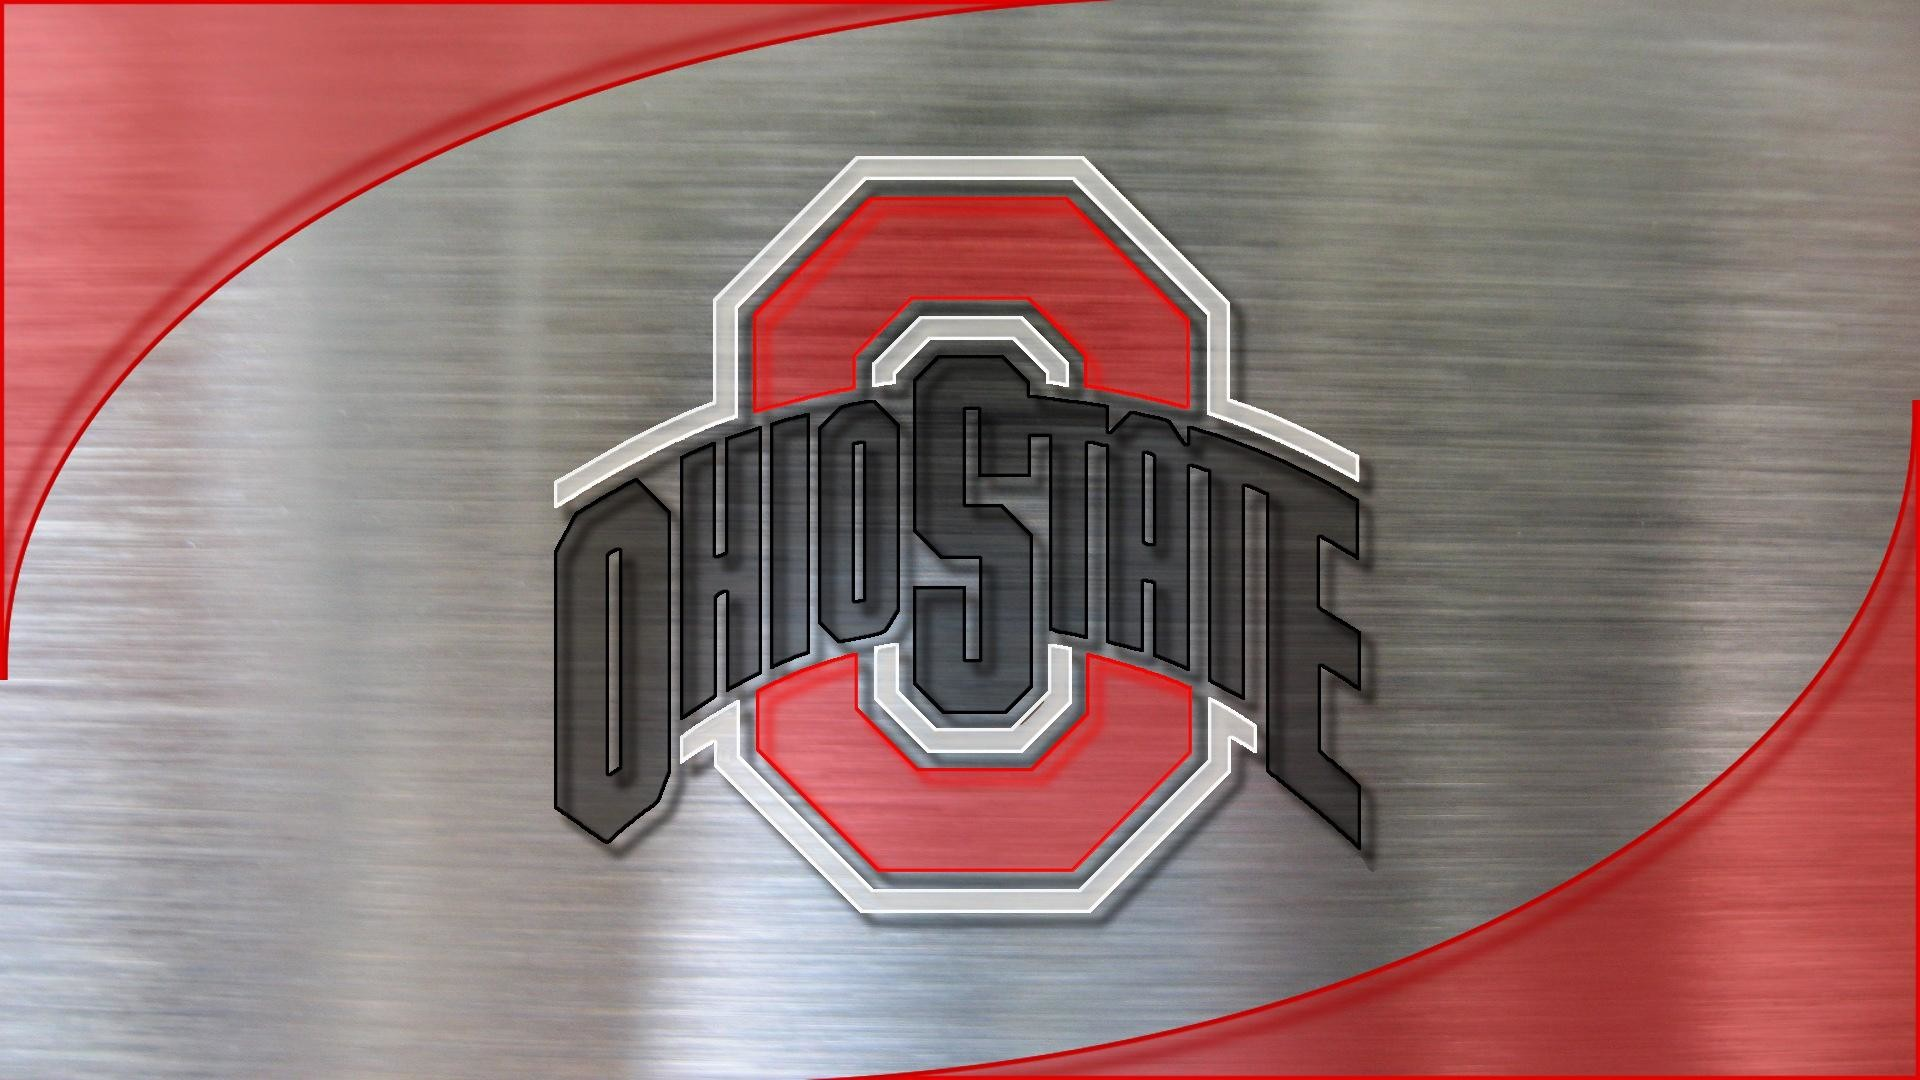 Ohio State Buckeyes Football Wallpapers Wallpaper 1920×1080 Buckeyes  Wallpapers (44 Wallpapers)  